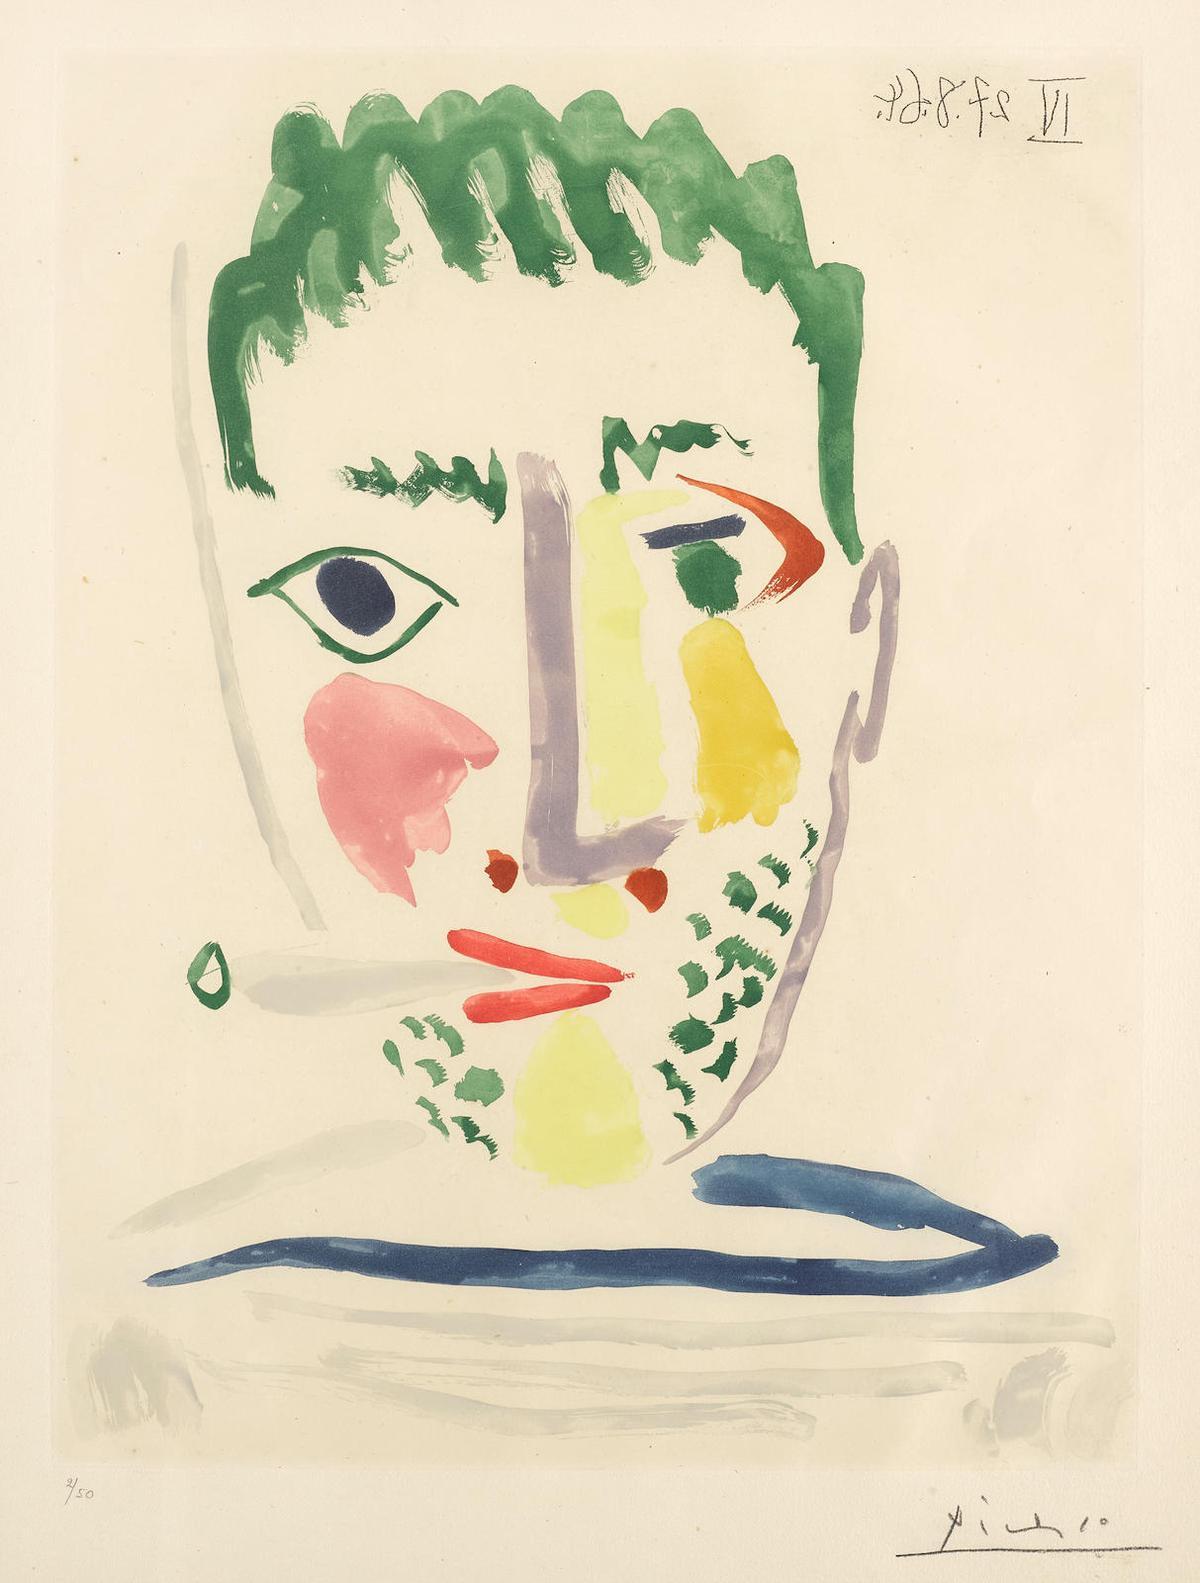 Pablo Picasso-Fumeur Au Maillot Raye Grise (B. 1172)-1964